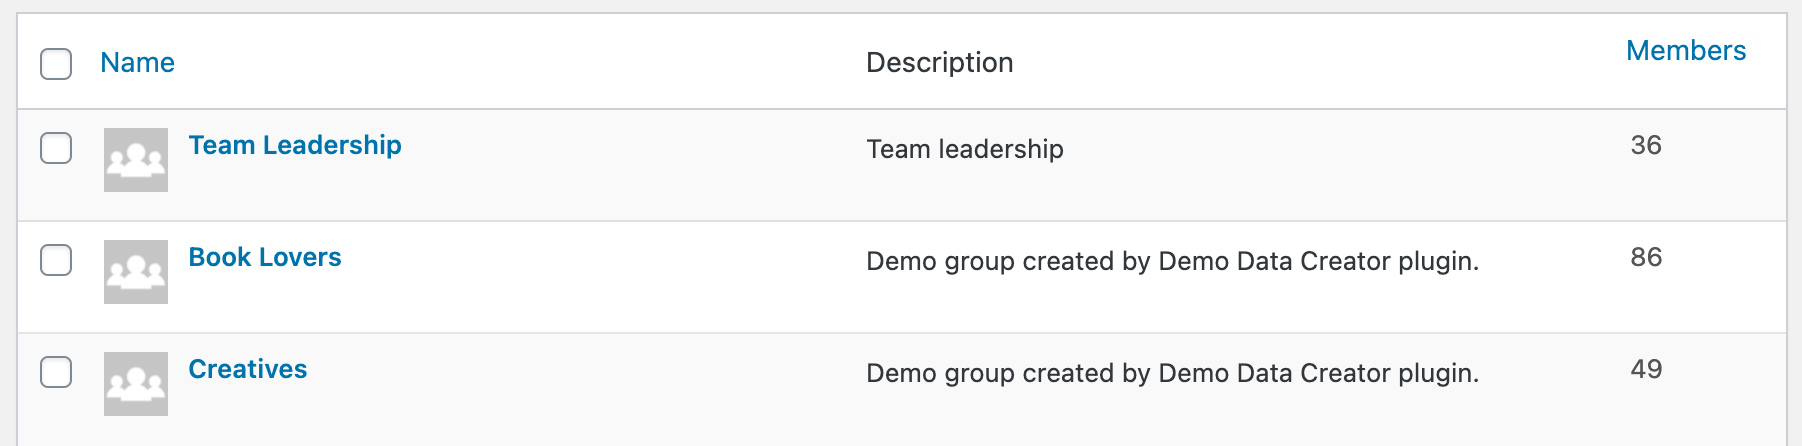 BuddyPress group list